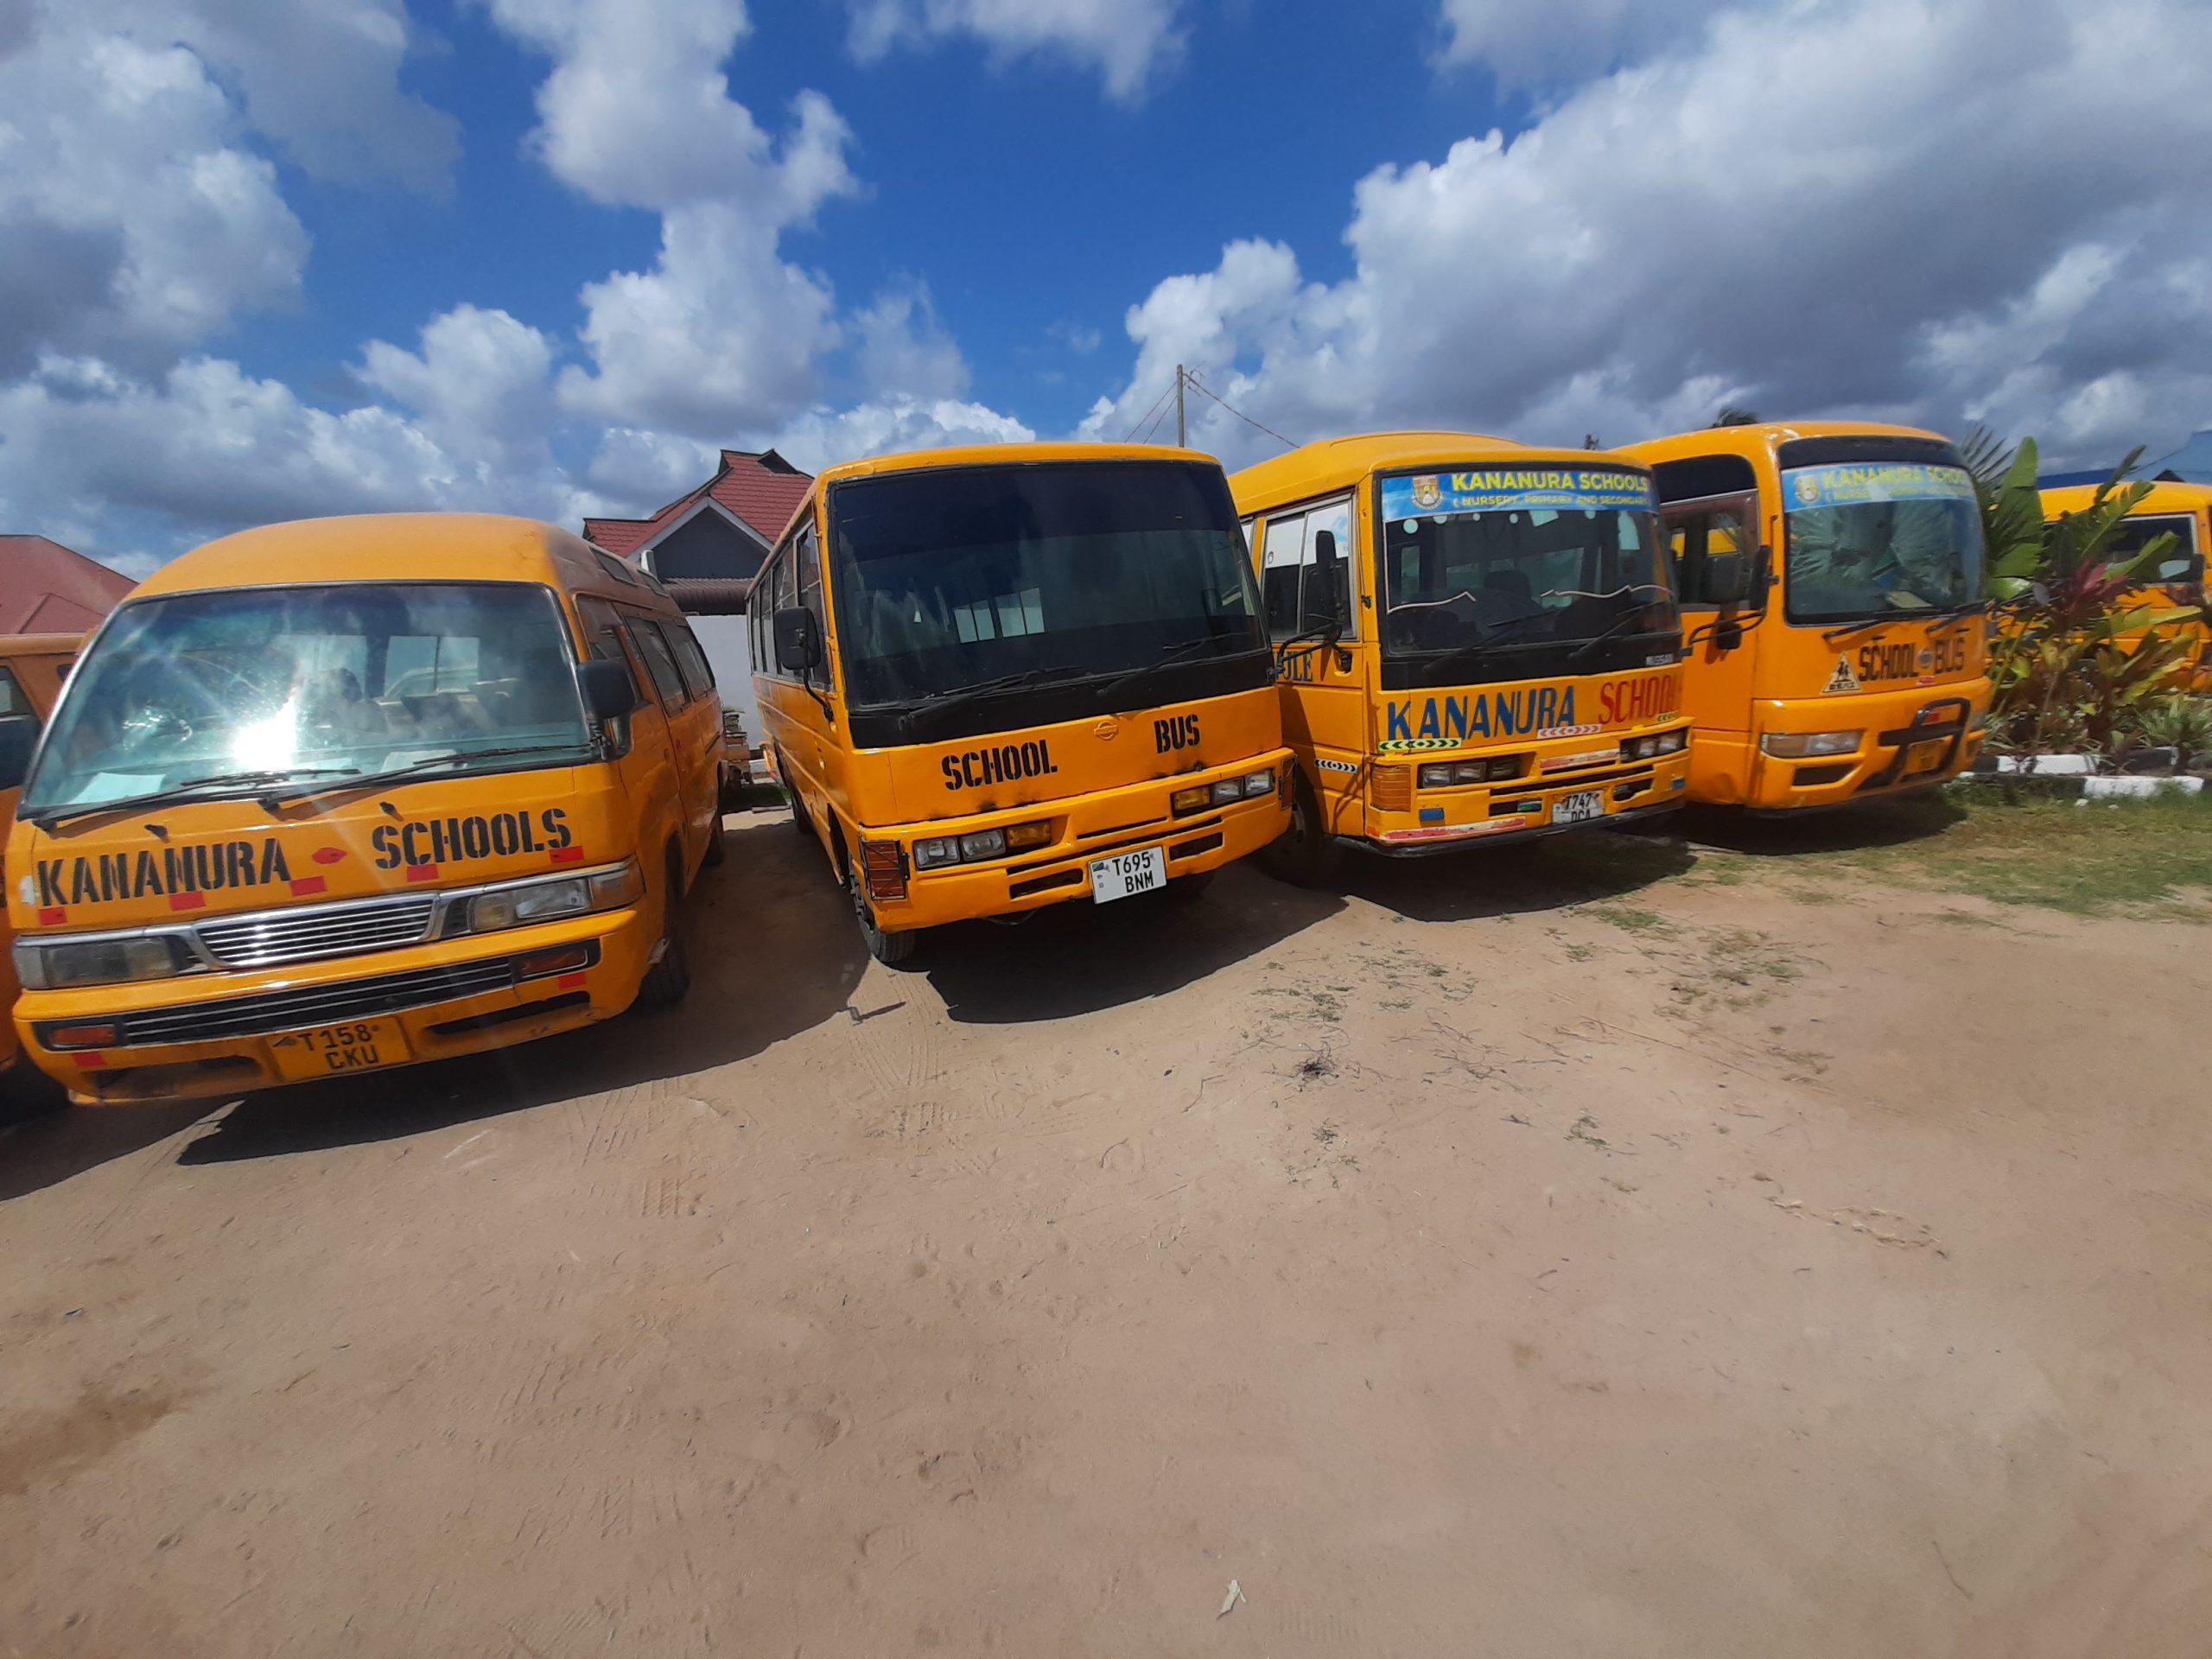 Kananura Schools Buses